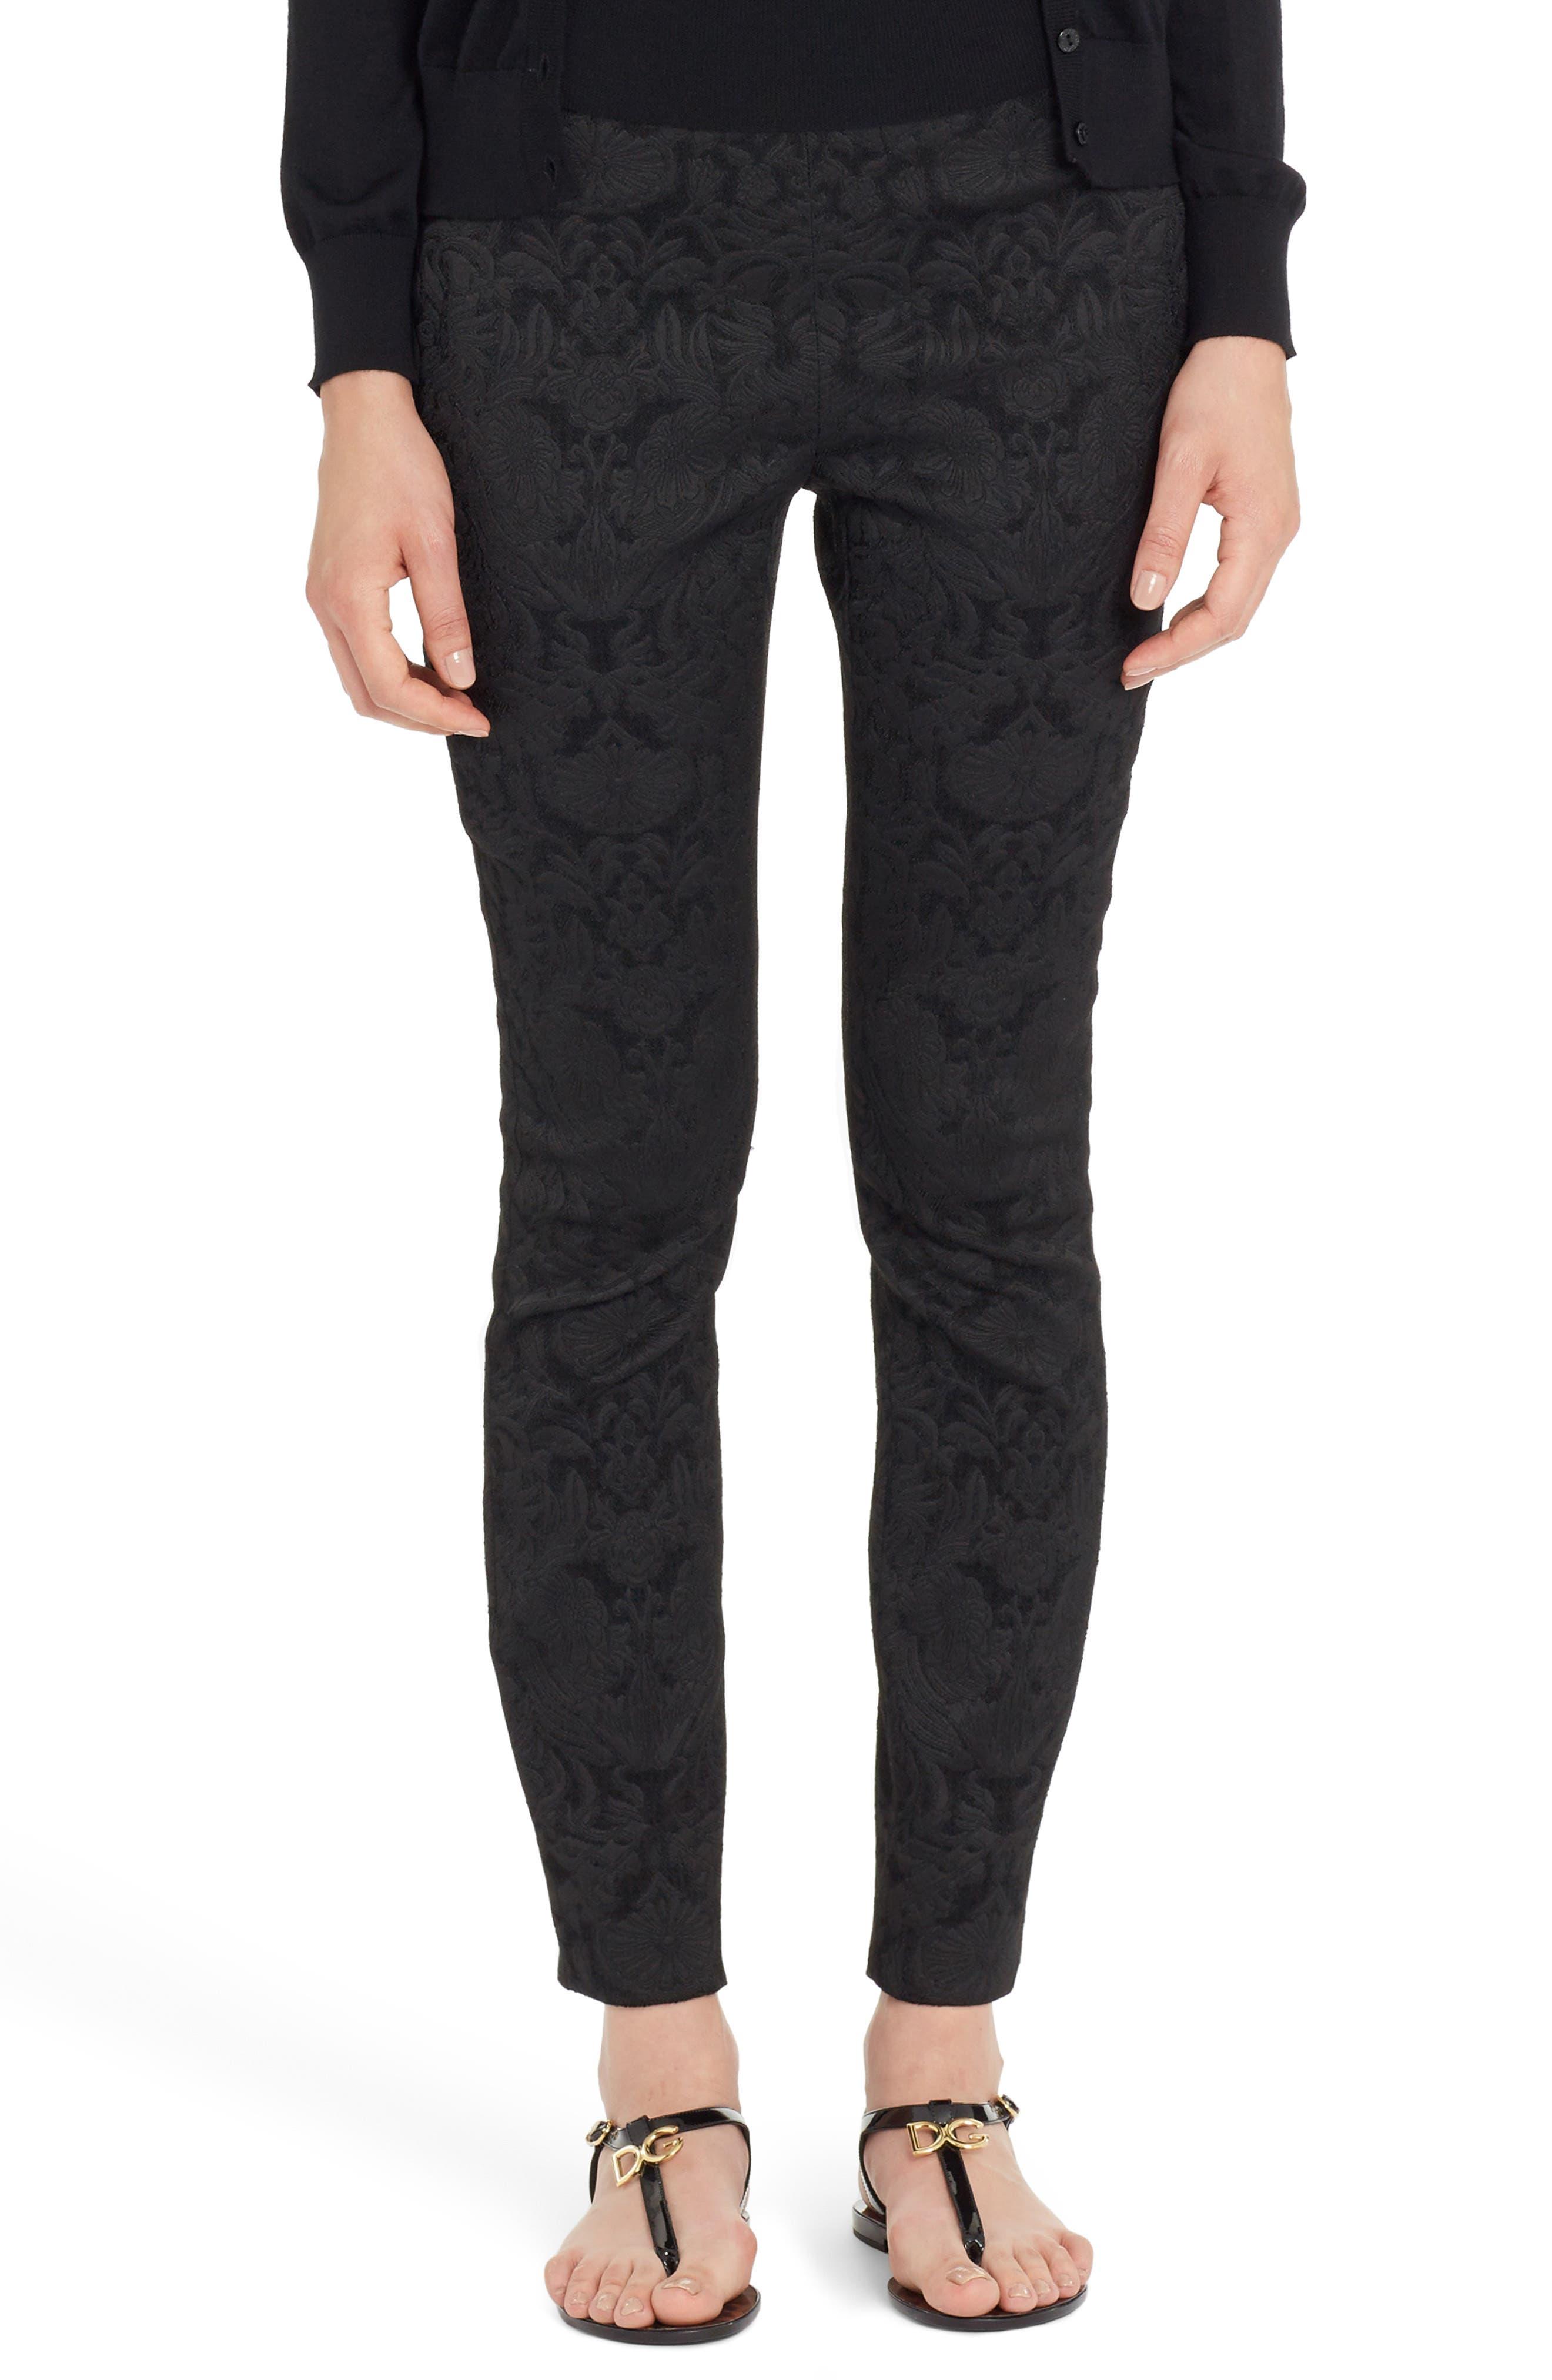 Stretch Jacquard Leggings,                         Main,                         color, Black